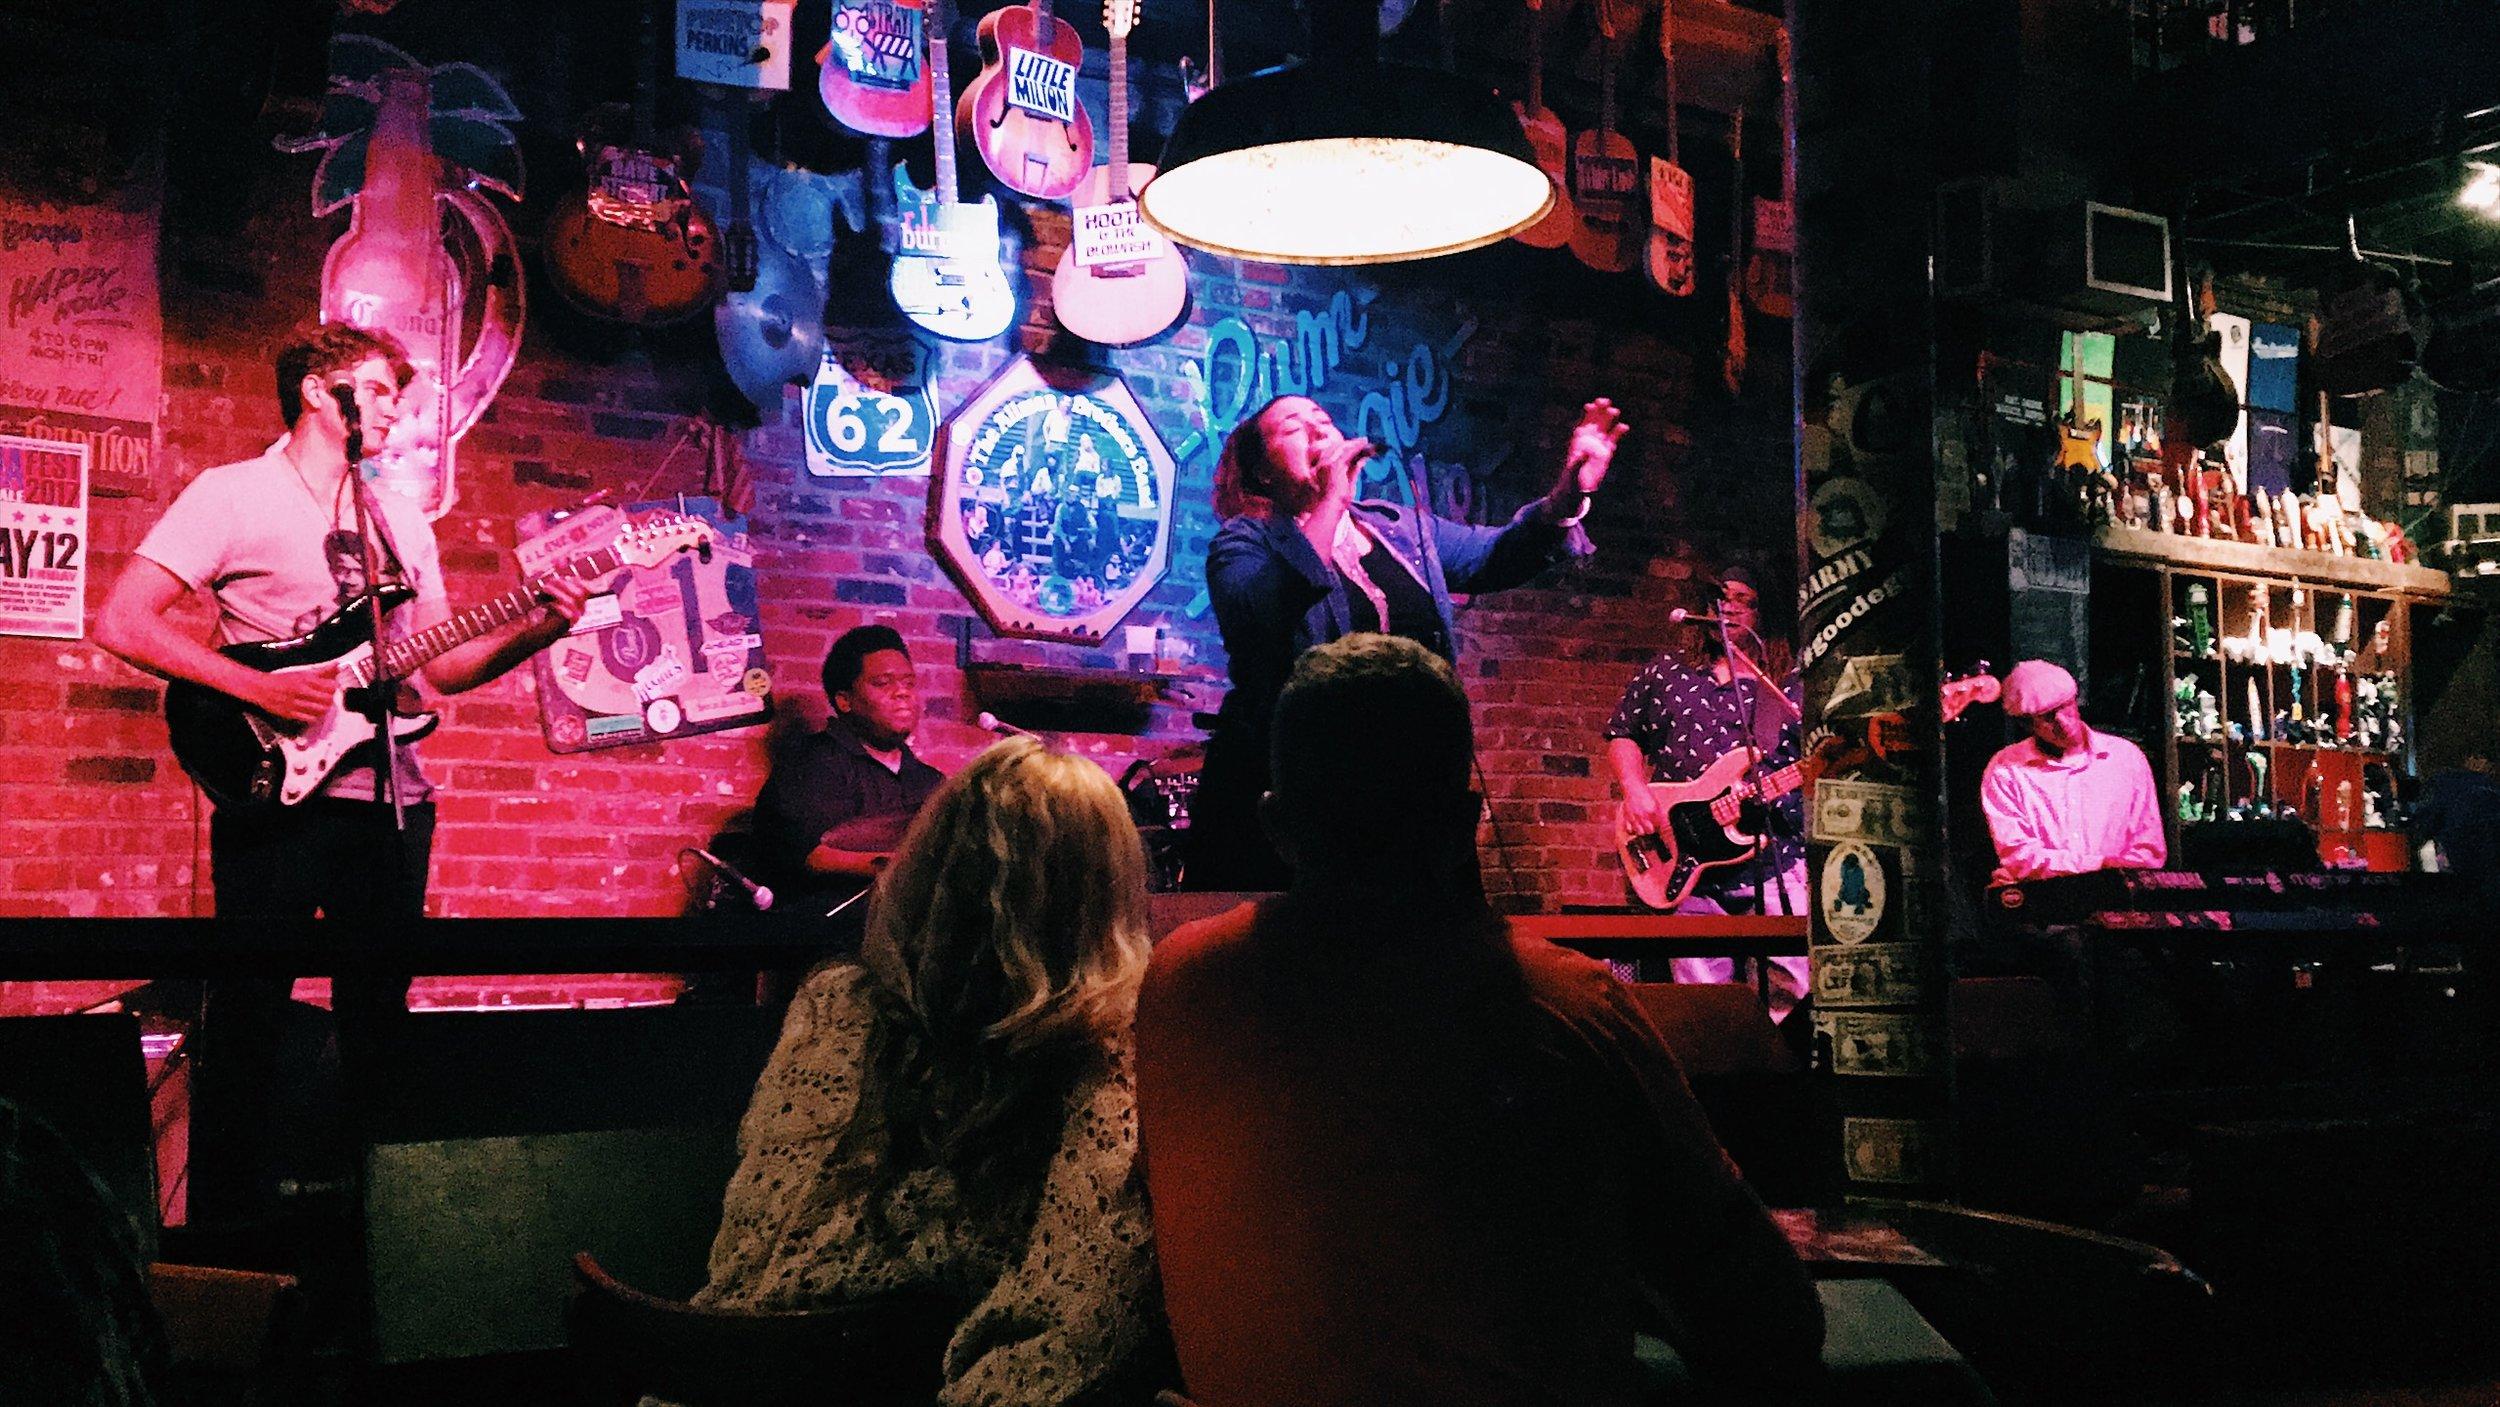 Live music @ Rum Boogie Cafe, Beale Street, Memphis